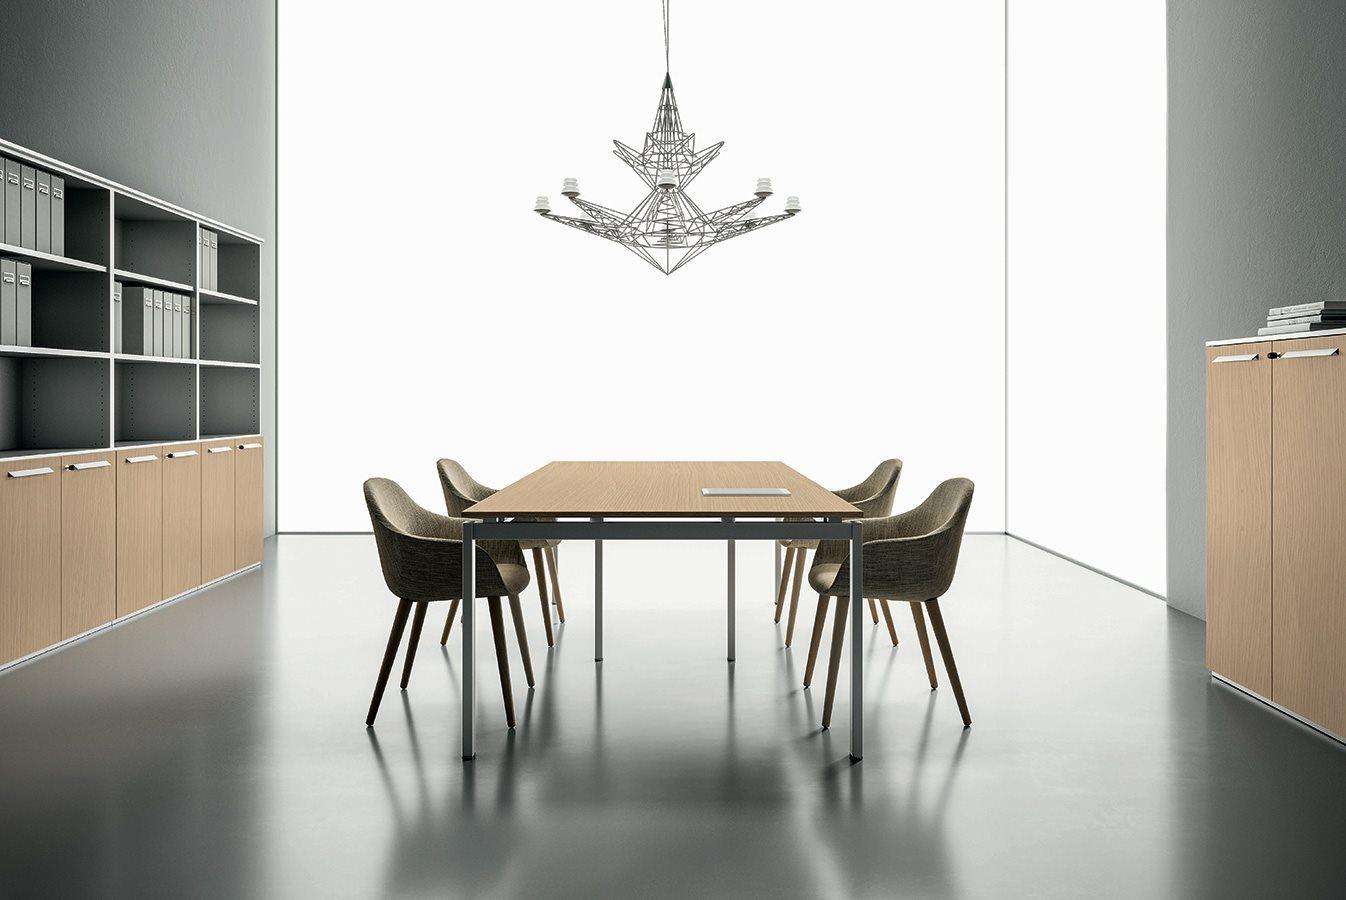 dvo_tavoli_DV990_workstation-table_gallery_4_zoom